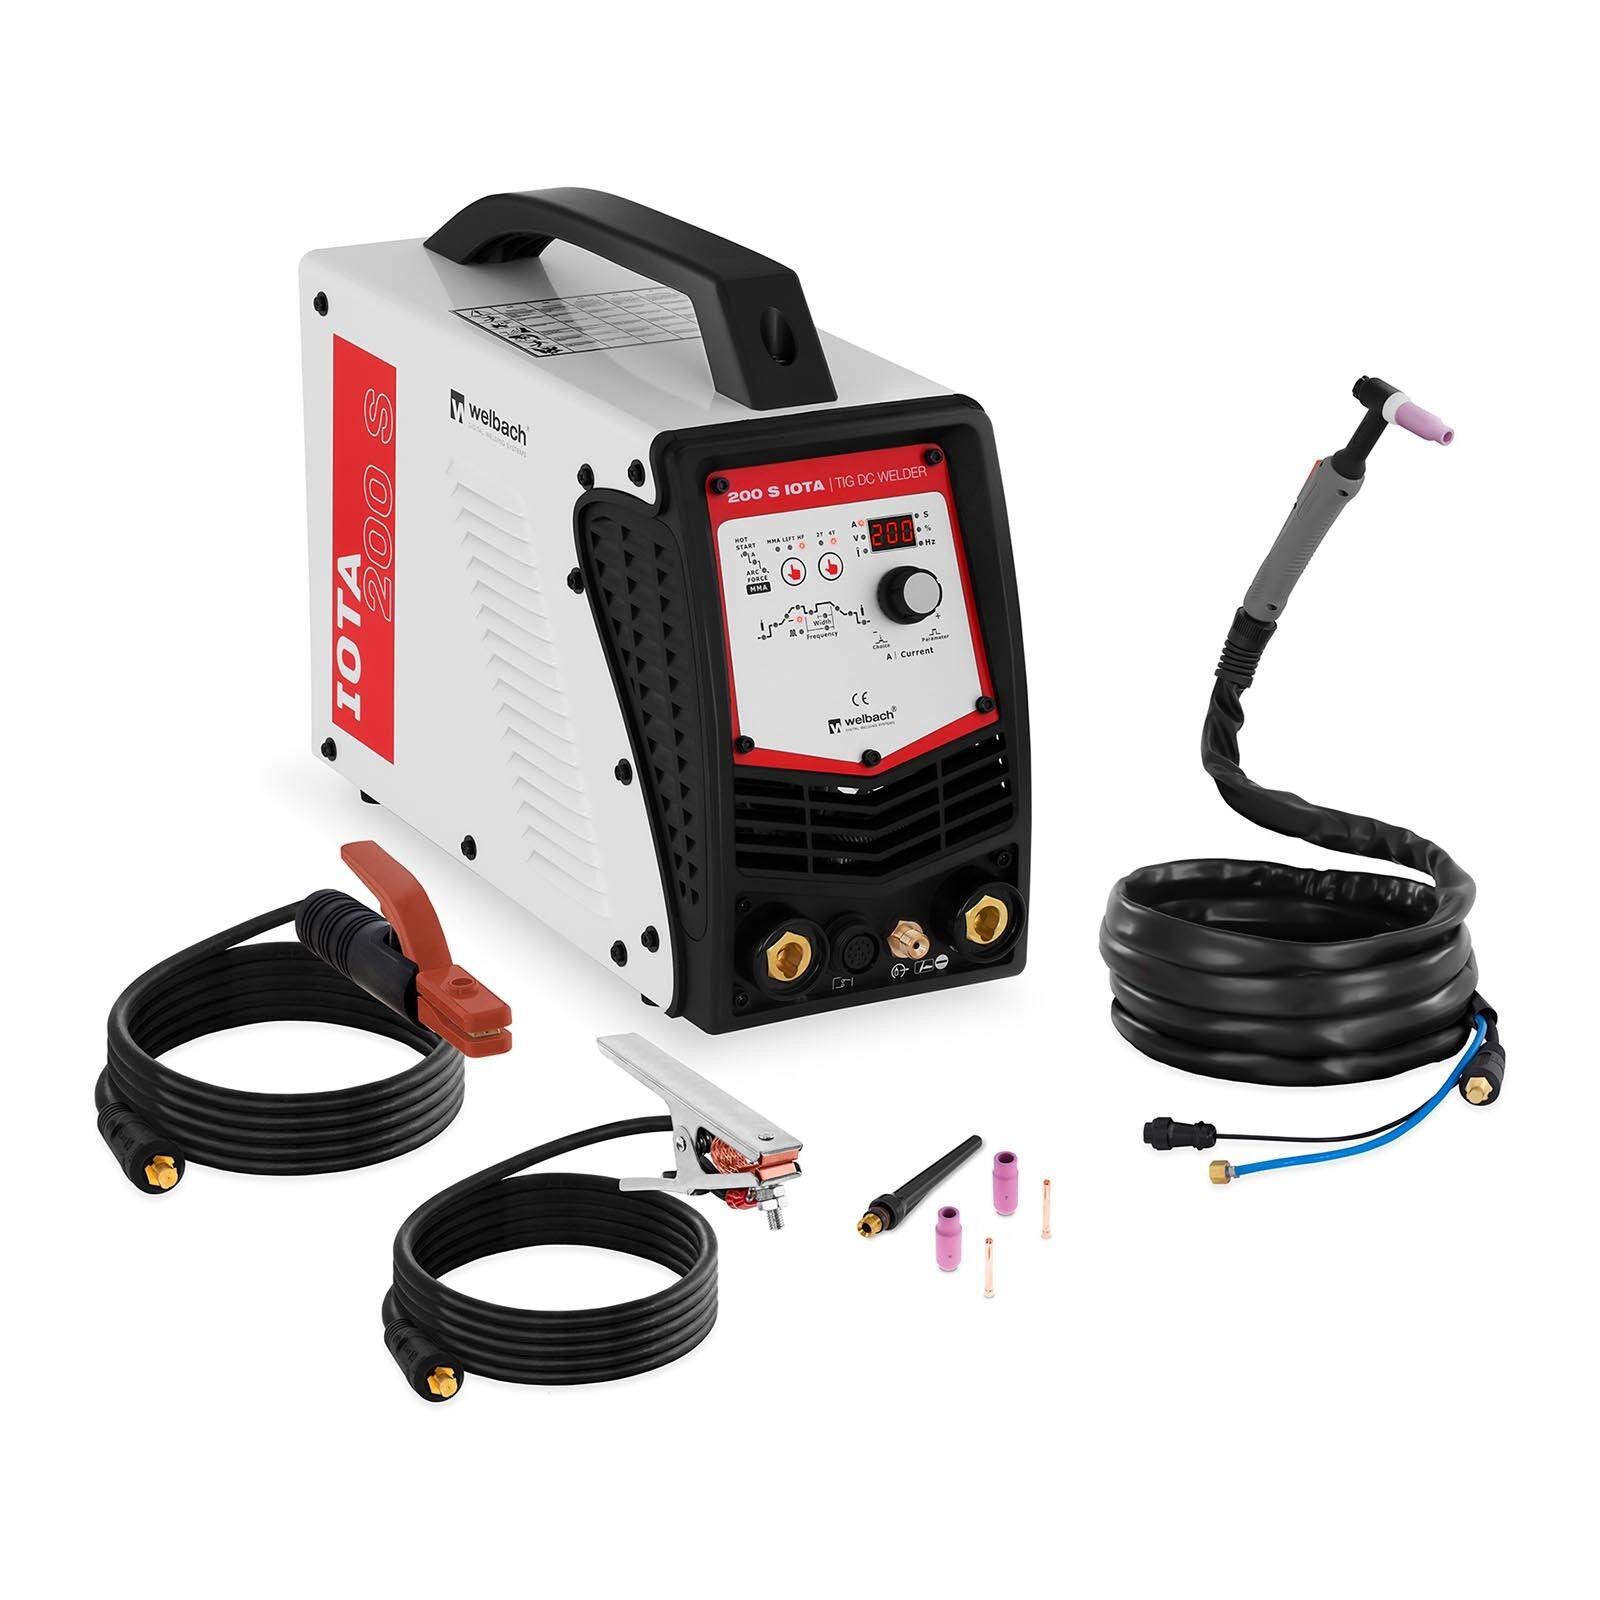 WIG Schweißgerät 200 Ampere - Digital Puls IGBT TIG DC LIFT HF E-Hand 2T/4T